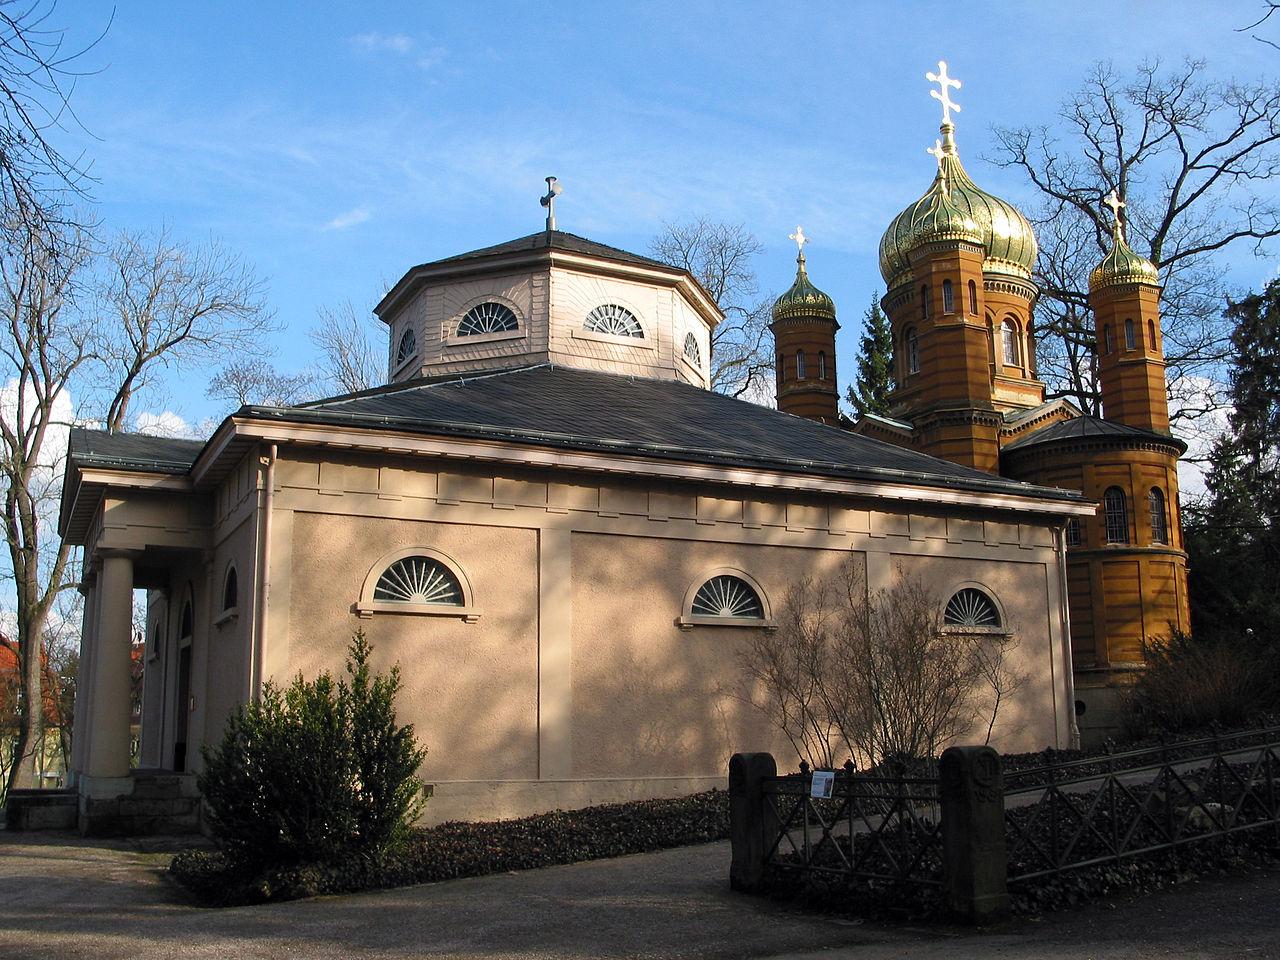 Bild Historischer Friedhof Weimar